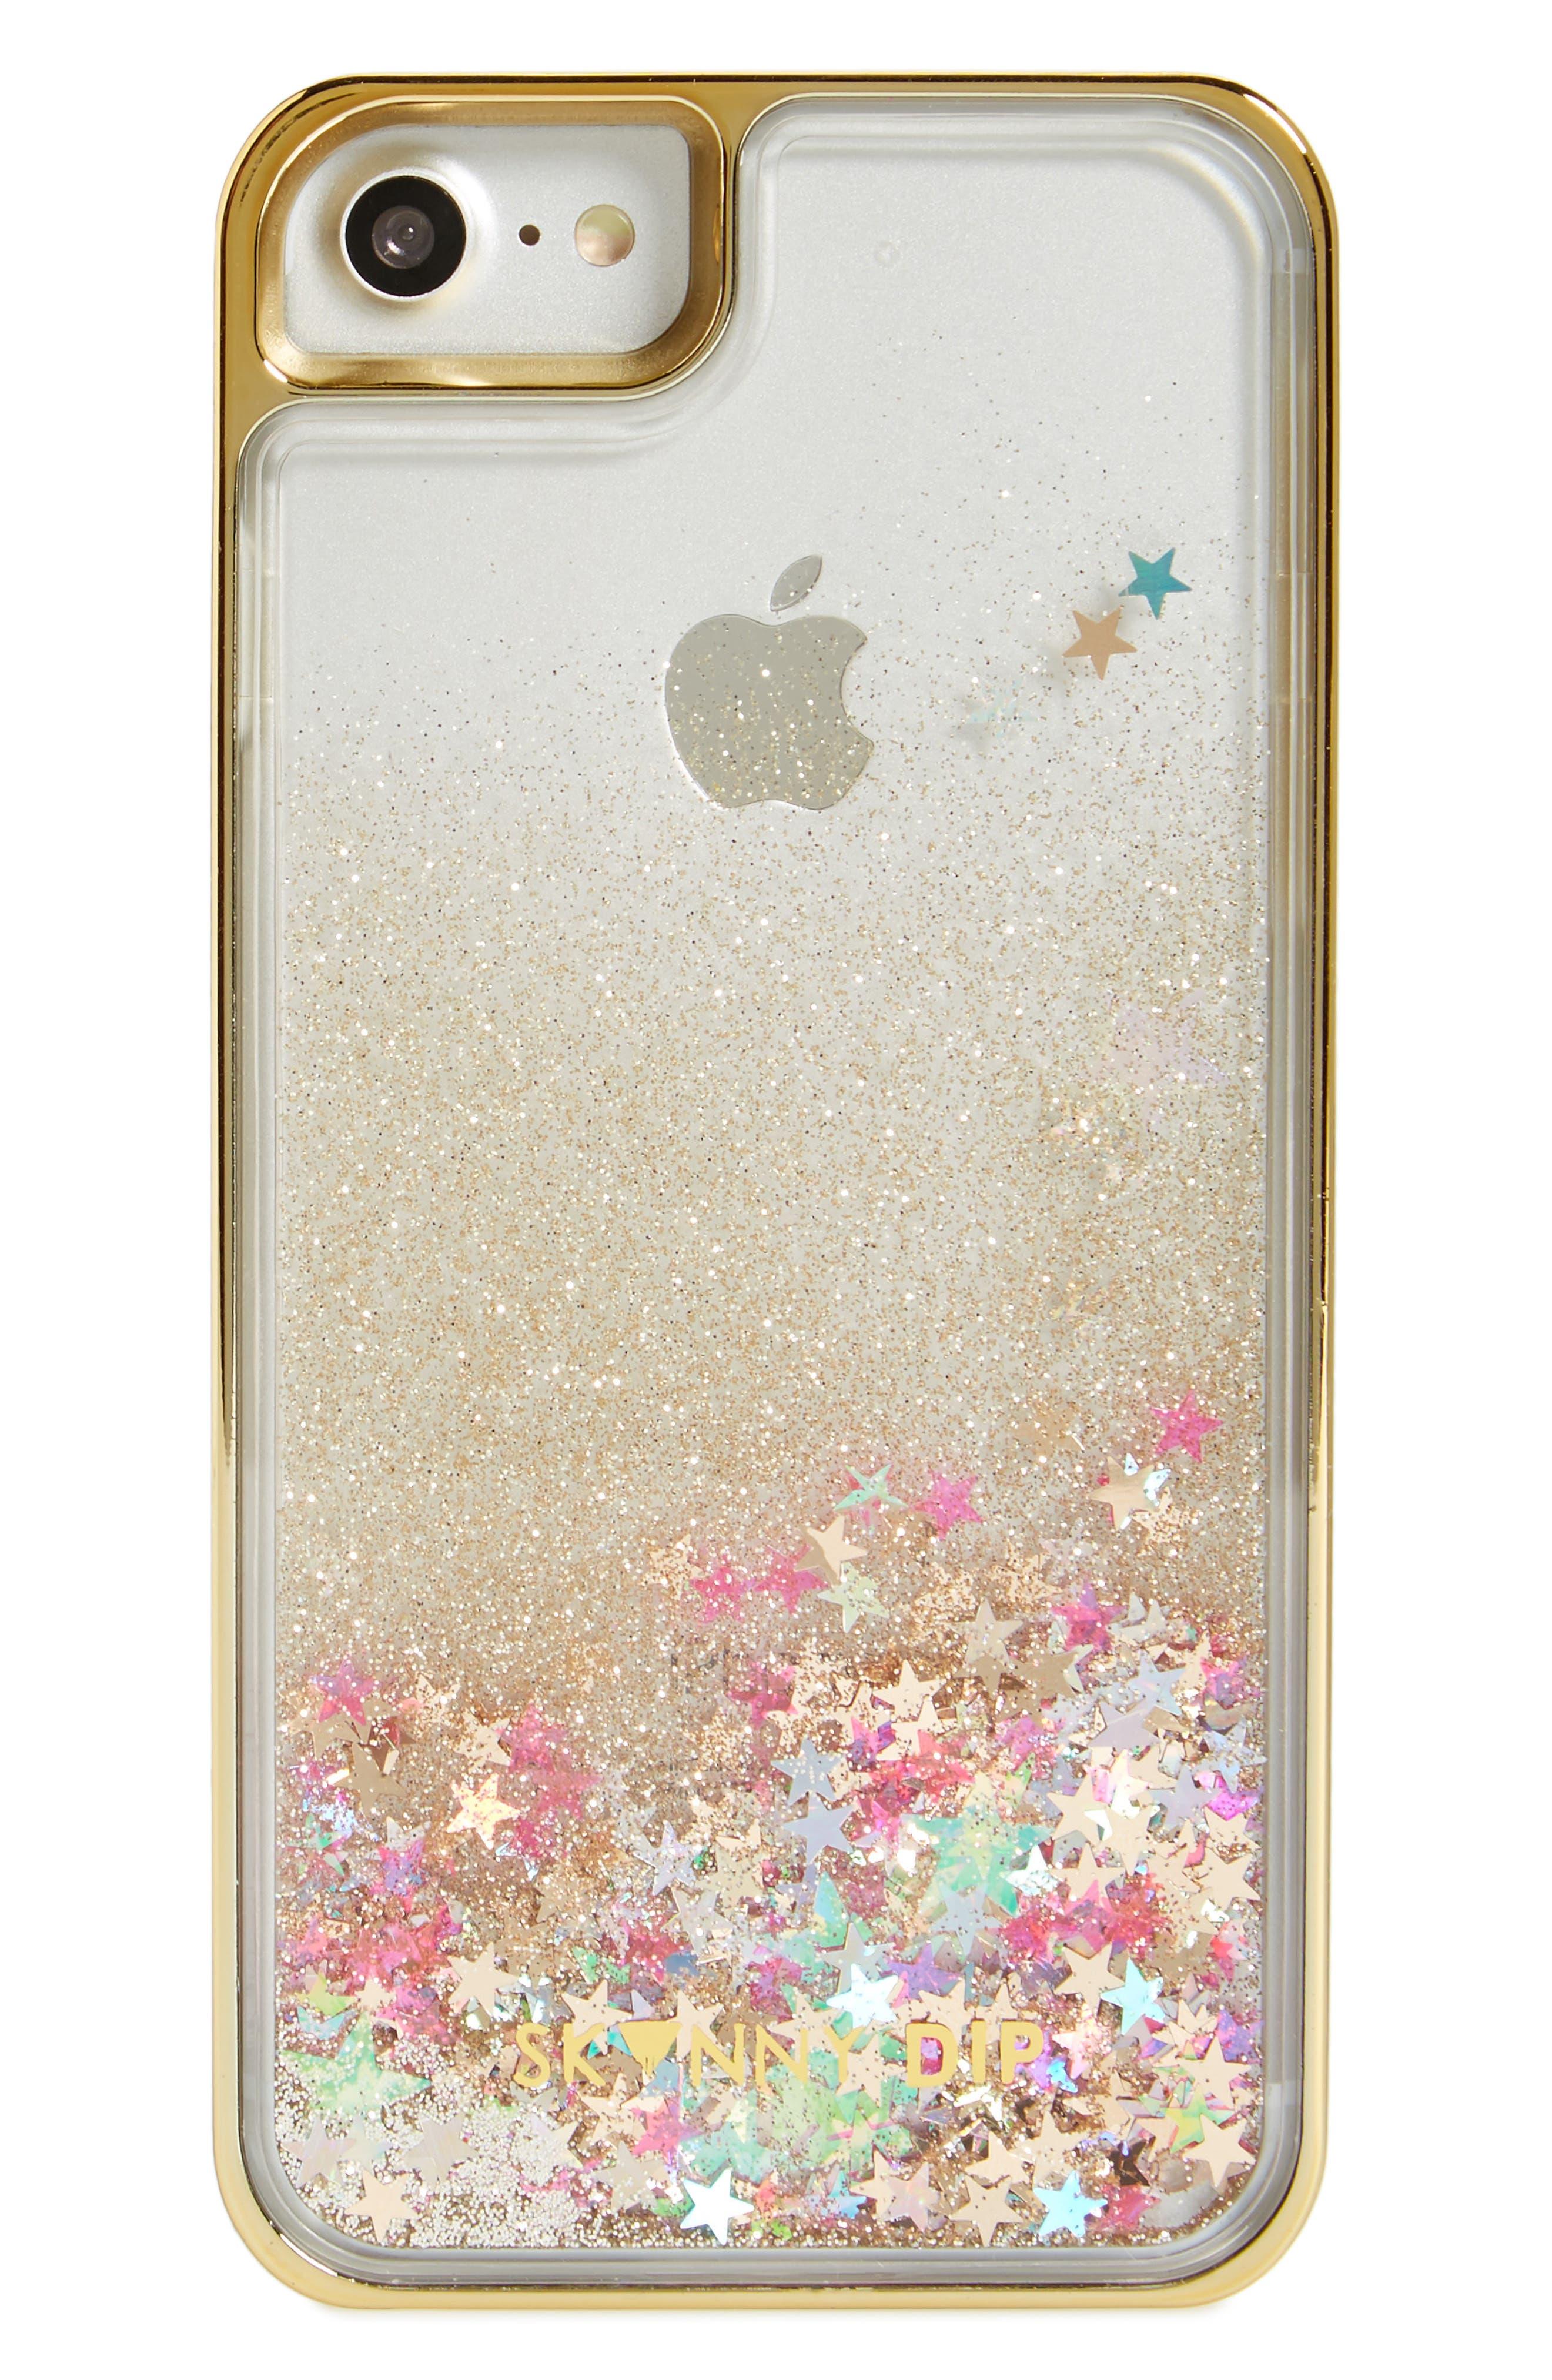 Main Image - Skinnydip Glory iPhone 6/7 & 6/7 Plus Case